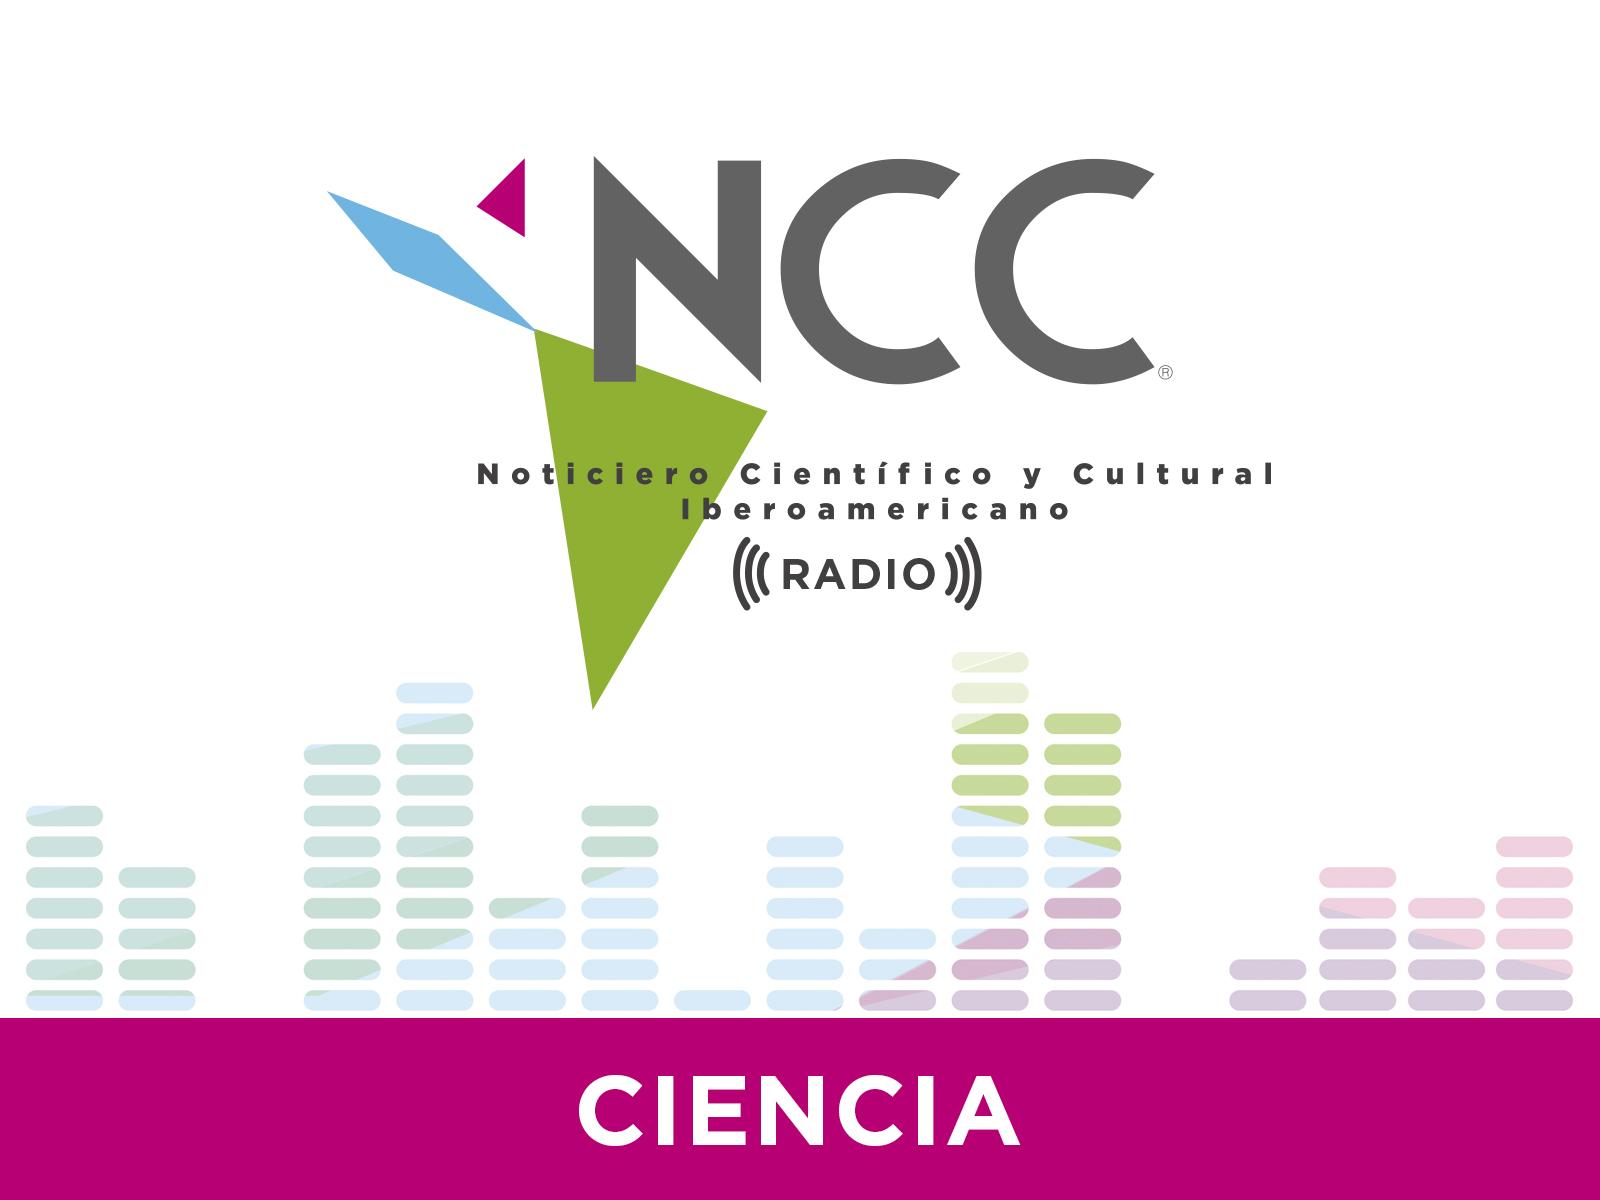 NCC Radio Ciencia